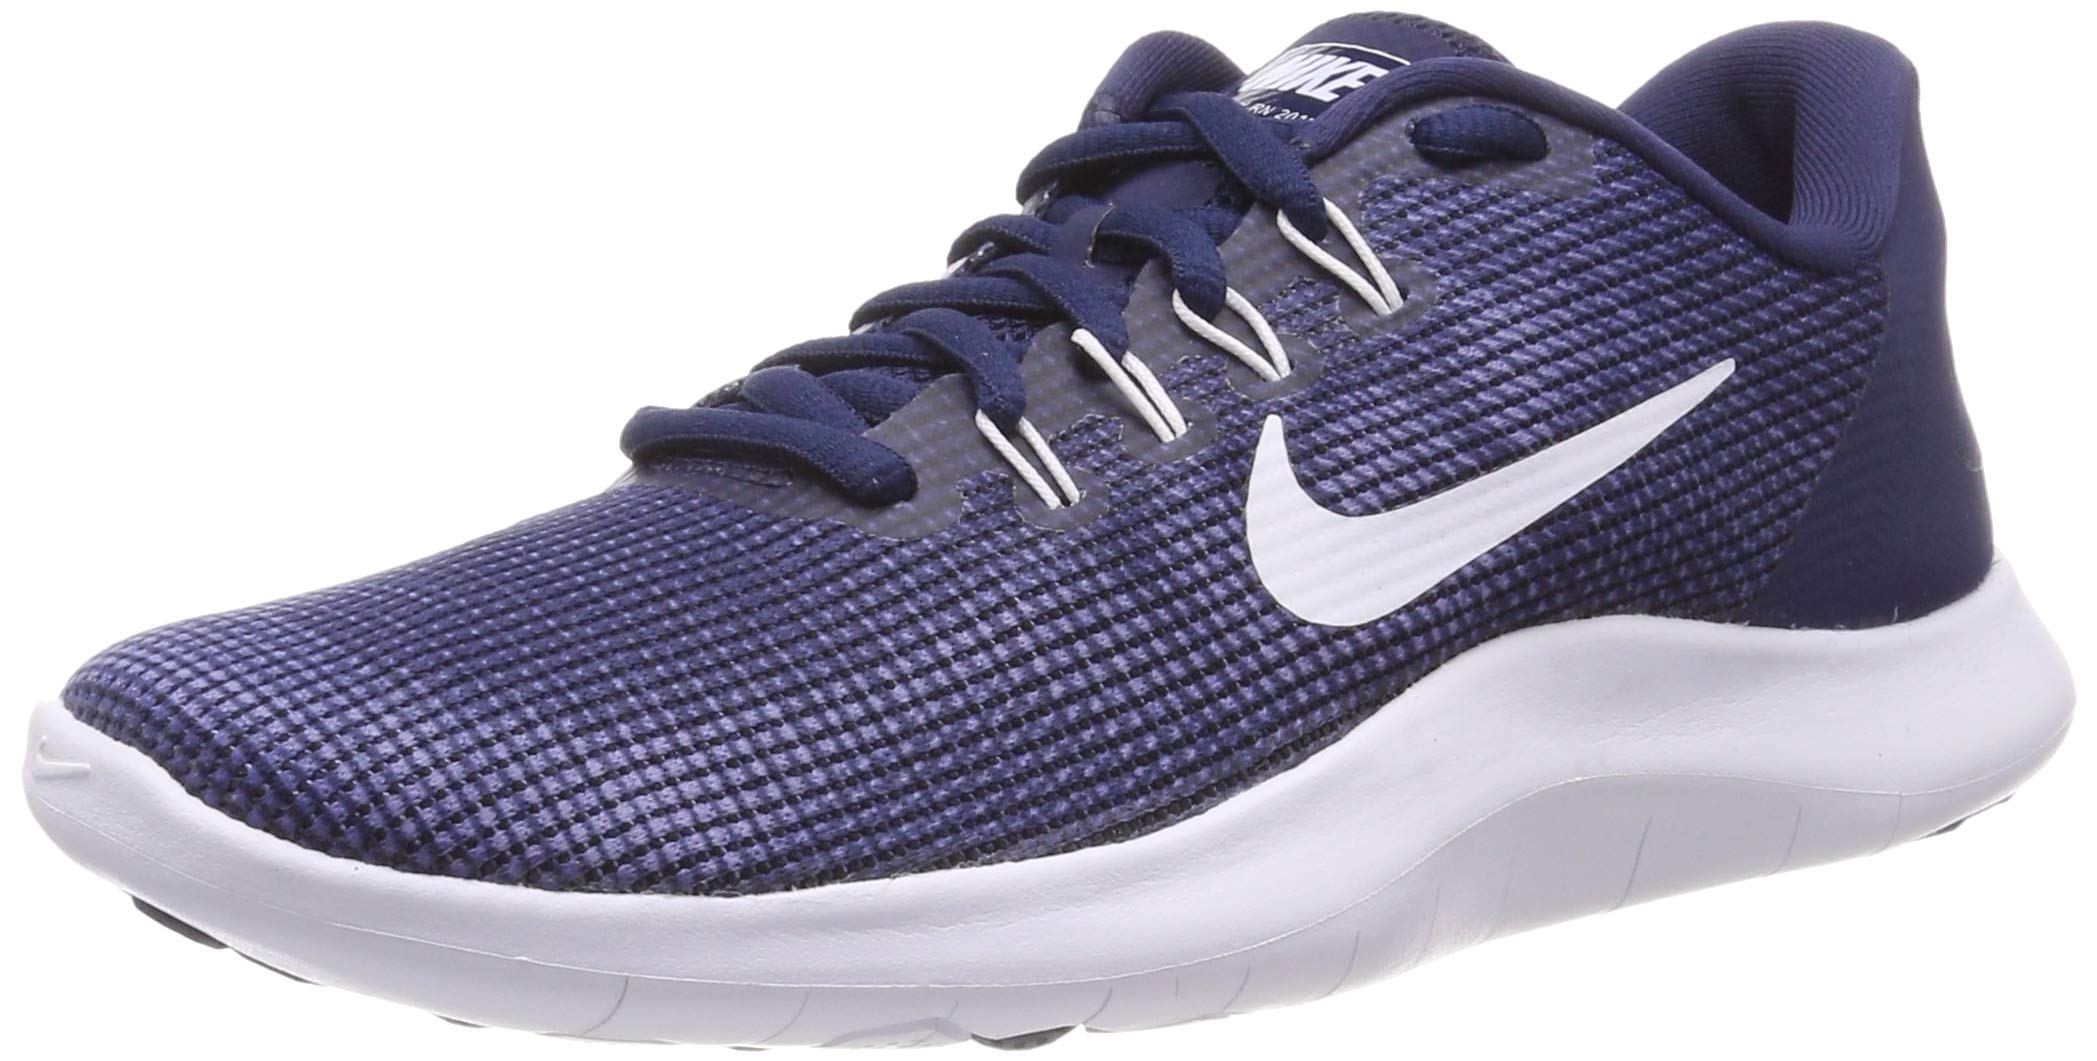 9281cc532dd6 Galleon - Nike Men s Flex RN 2018 Running Shoe Midnight Navy White-Blue  Recall (10 D US)